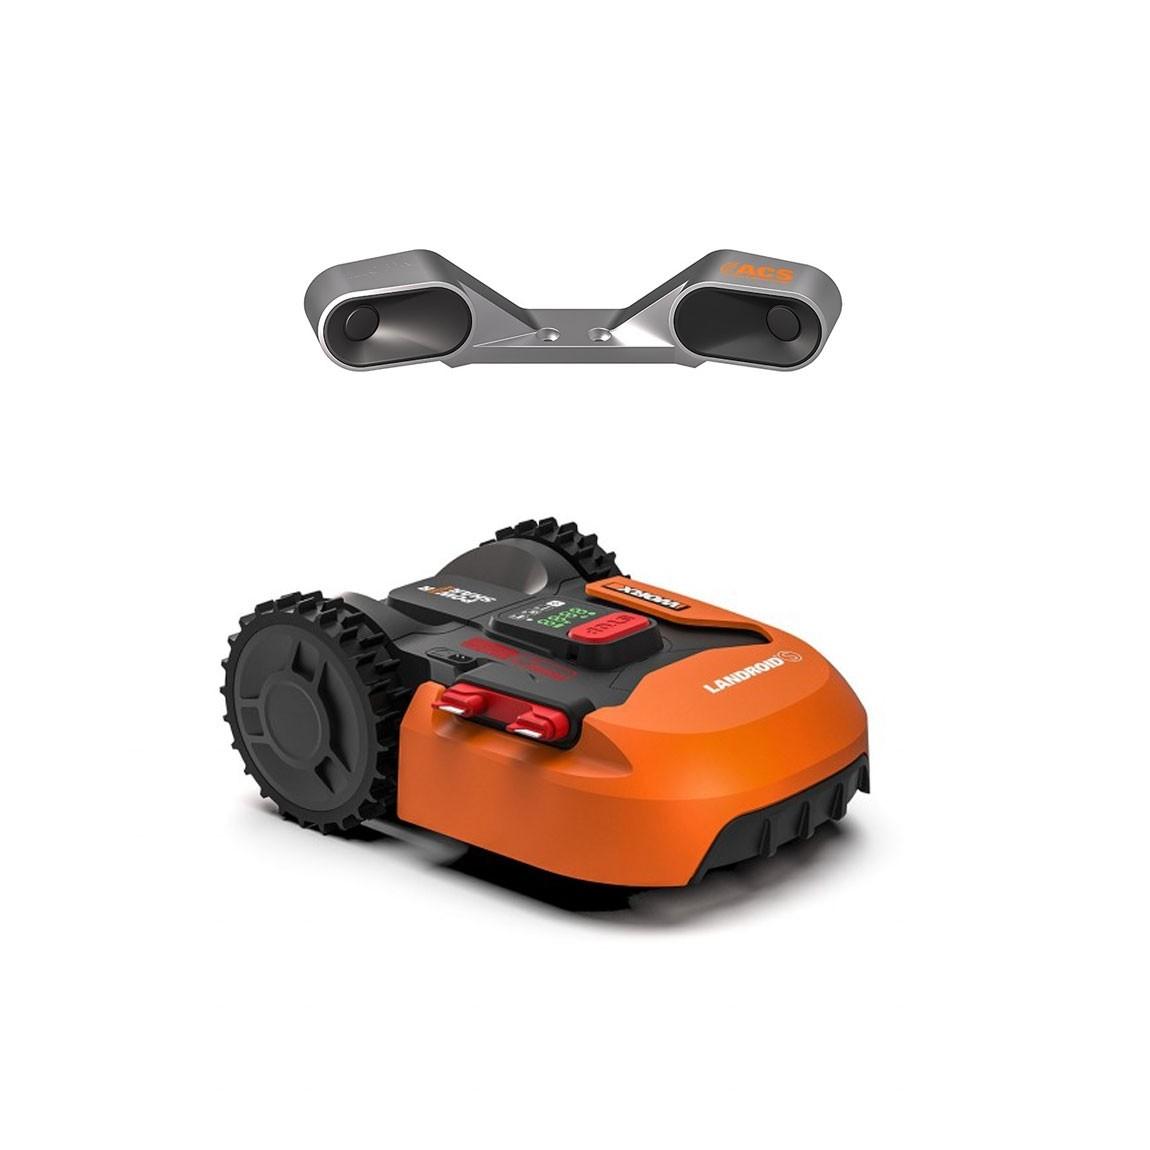 Worx Landroid S300 + Worx ACS - Kollisionssensor